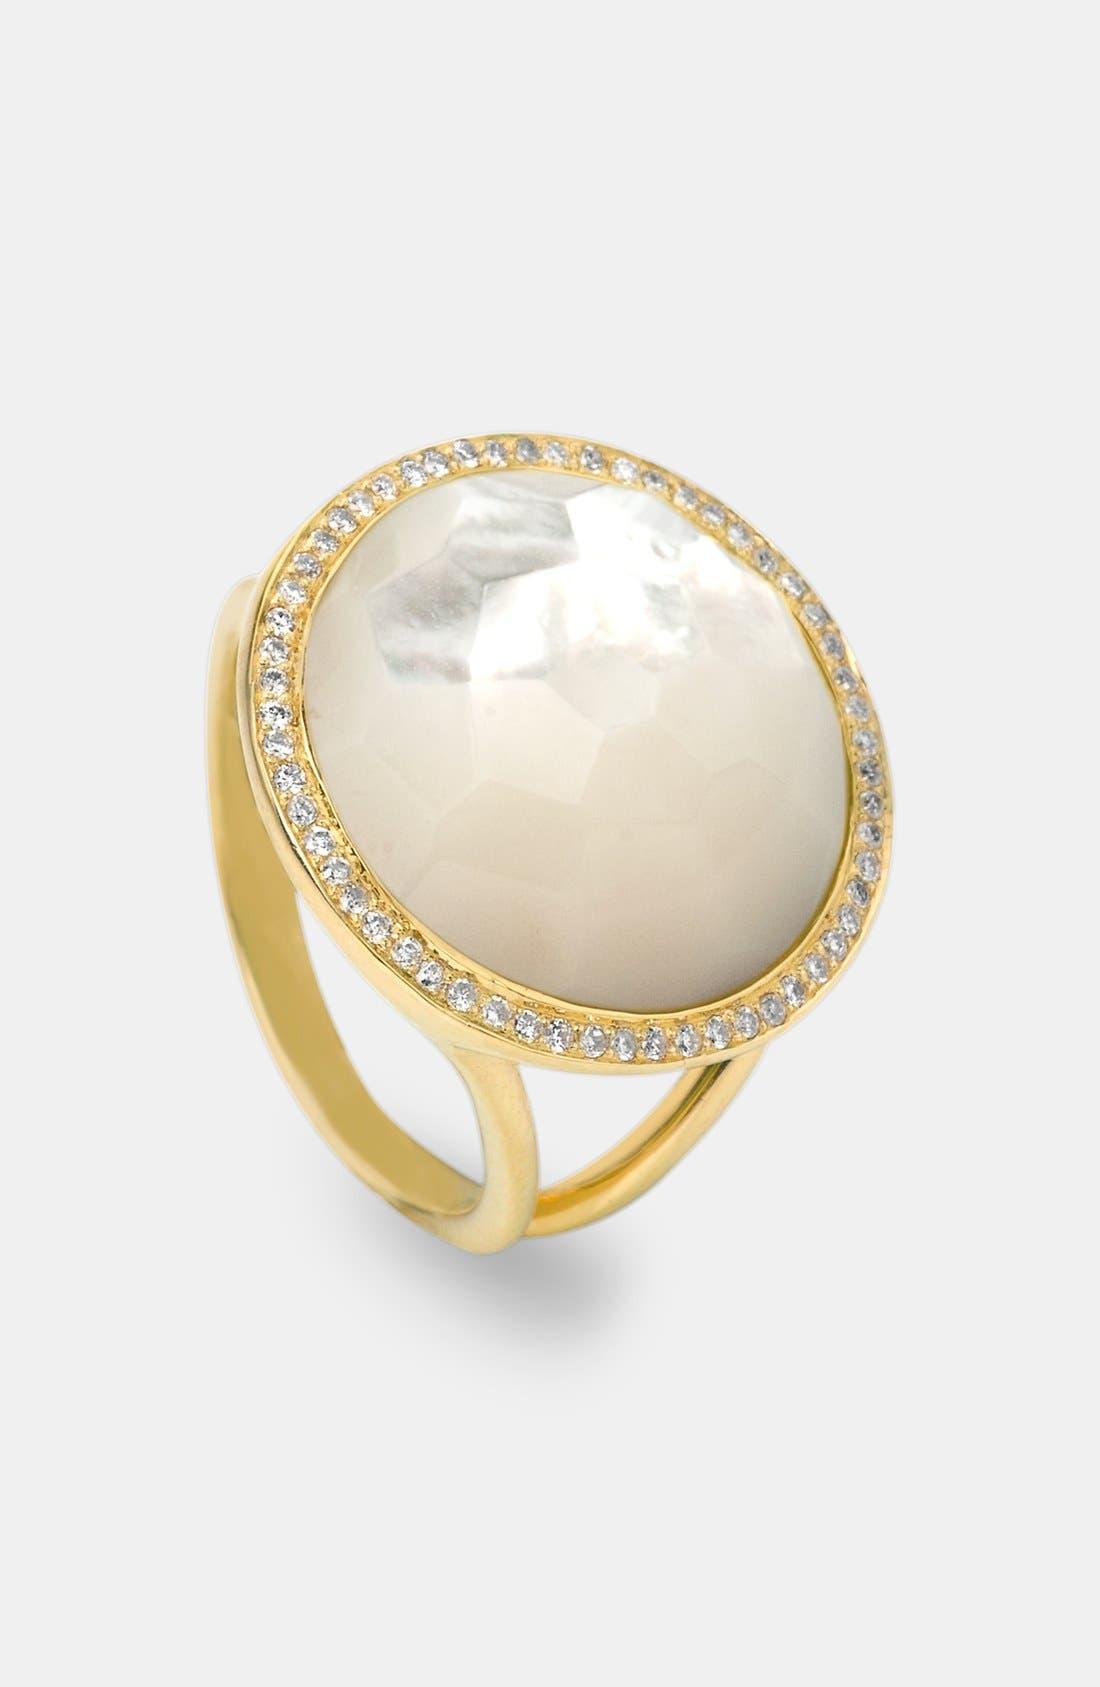 Alternate Image 1 Selected - Ippolita 'Rock Candy - Lollipop' 18k Gold Ring